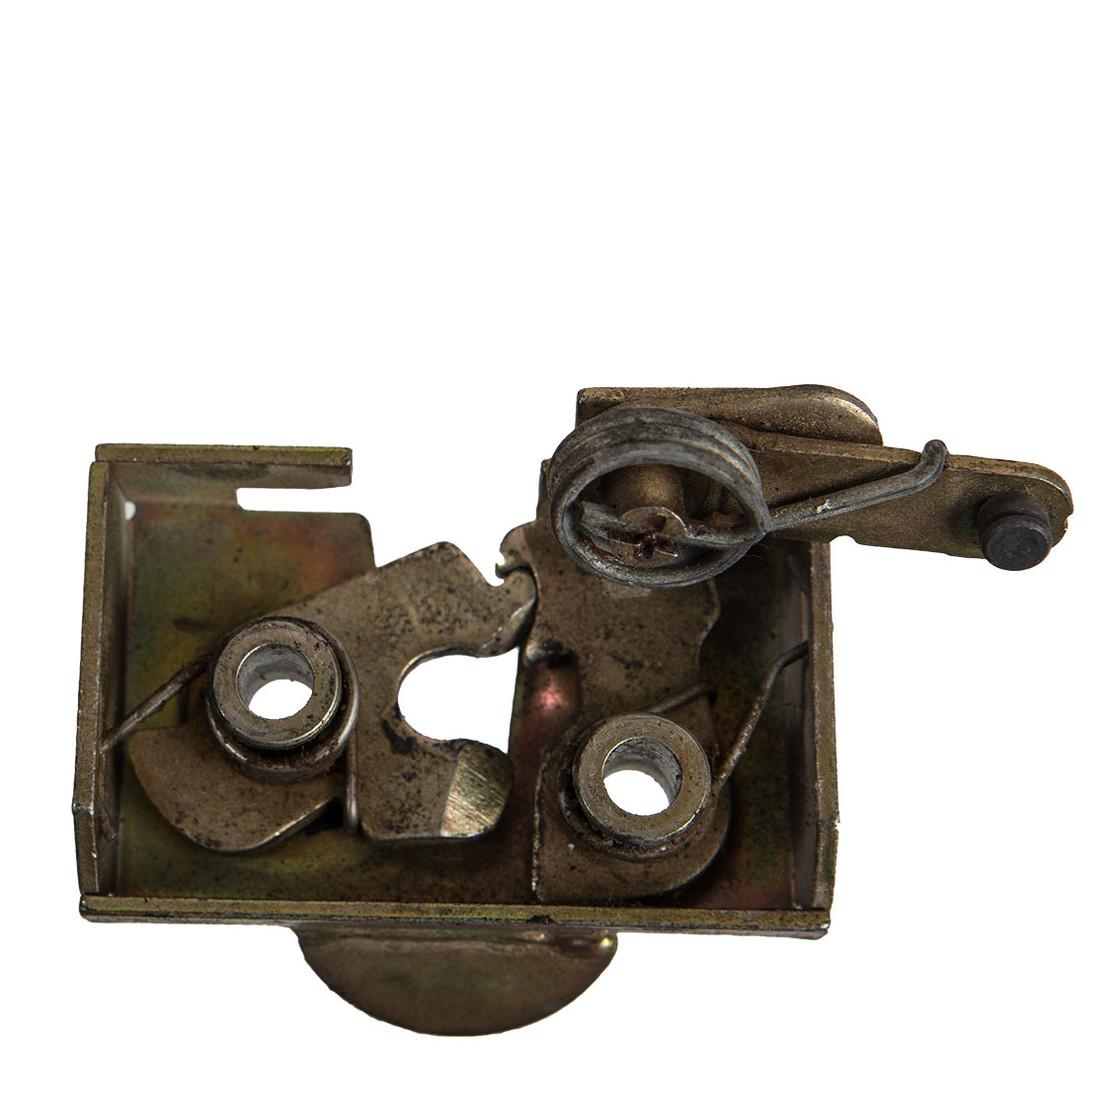 T25 used central lock for sliding door right, rear, orig  VW, OEM